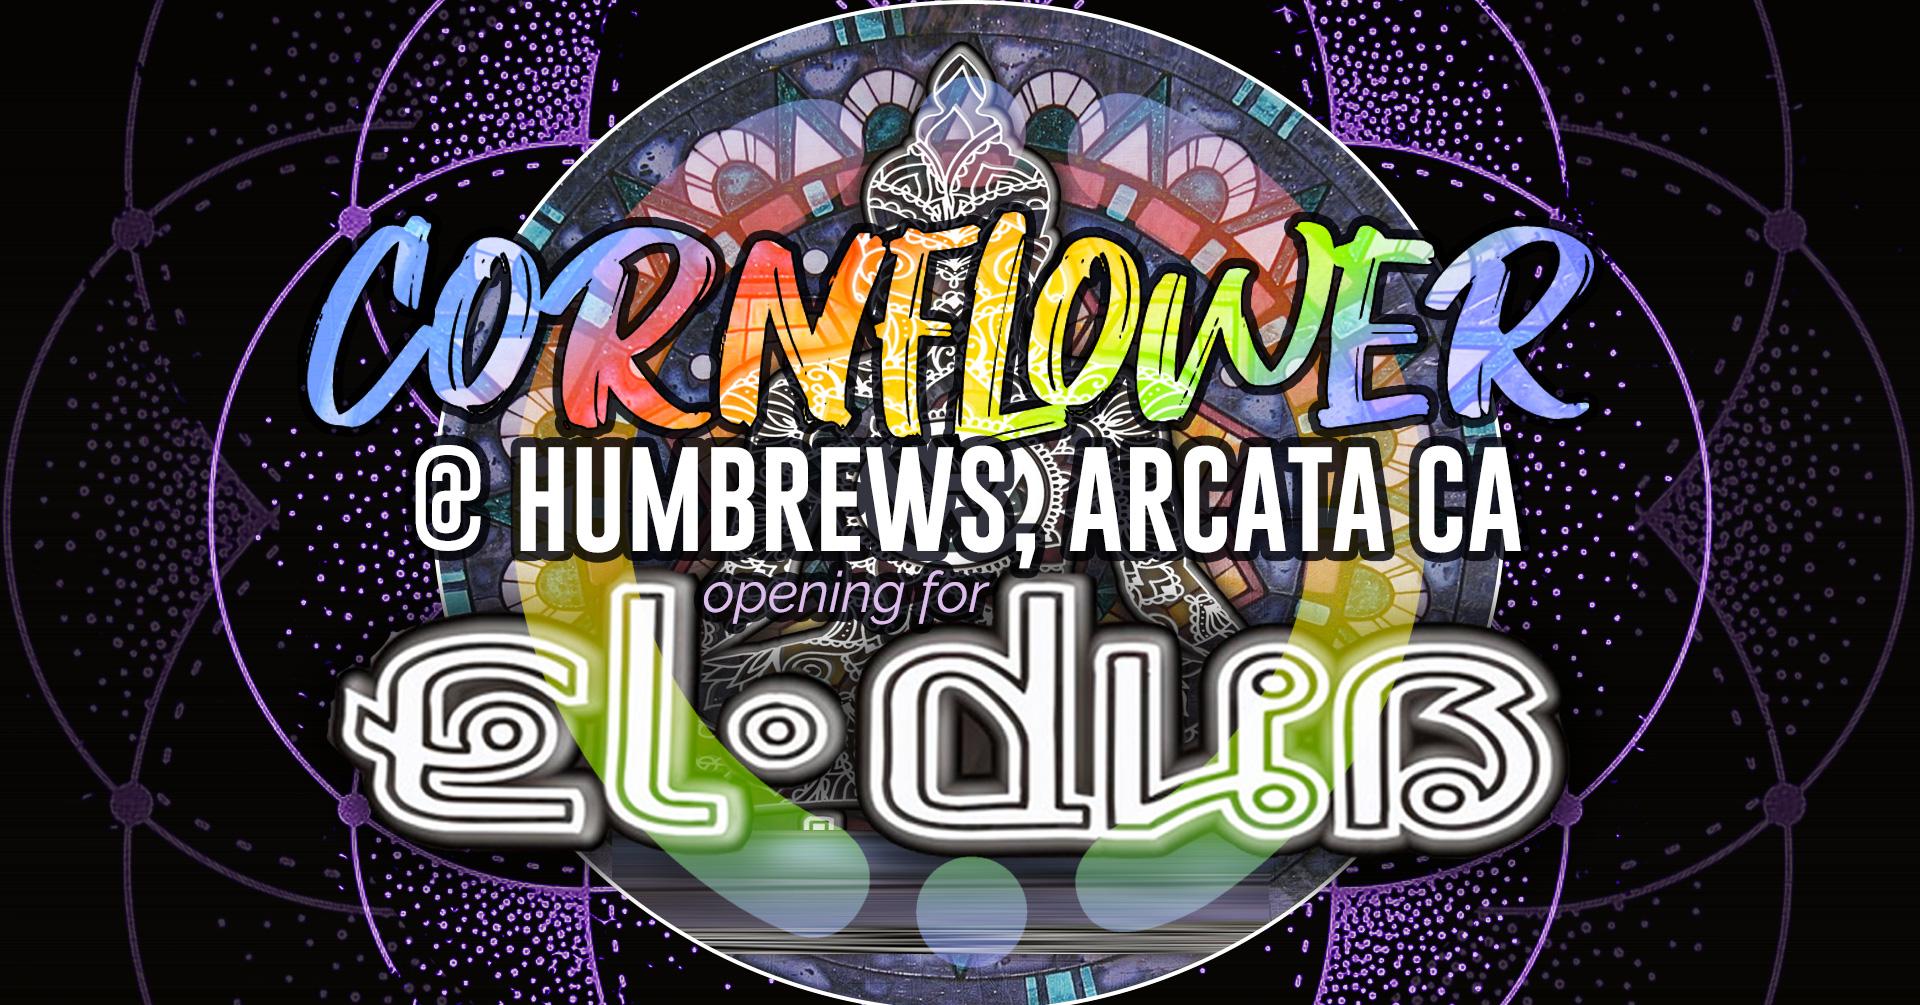 20190914-CA-Arcata-Humbrews-FBEvent-CoverPhoto.jpg